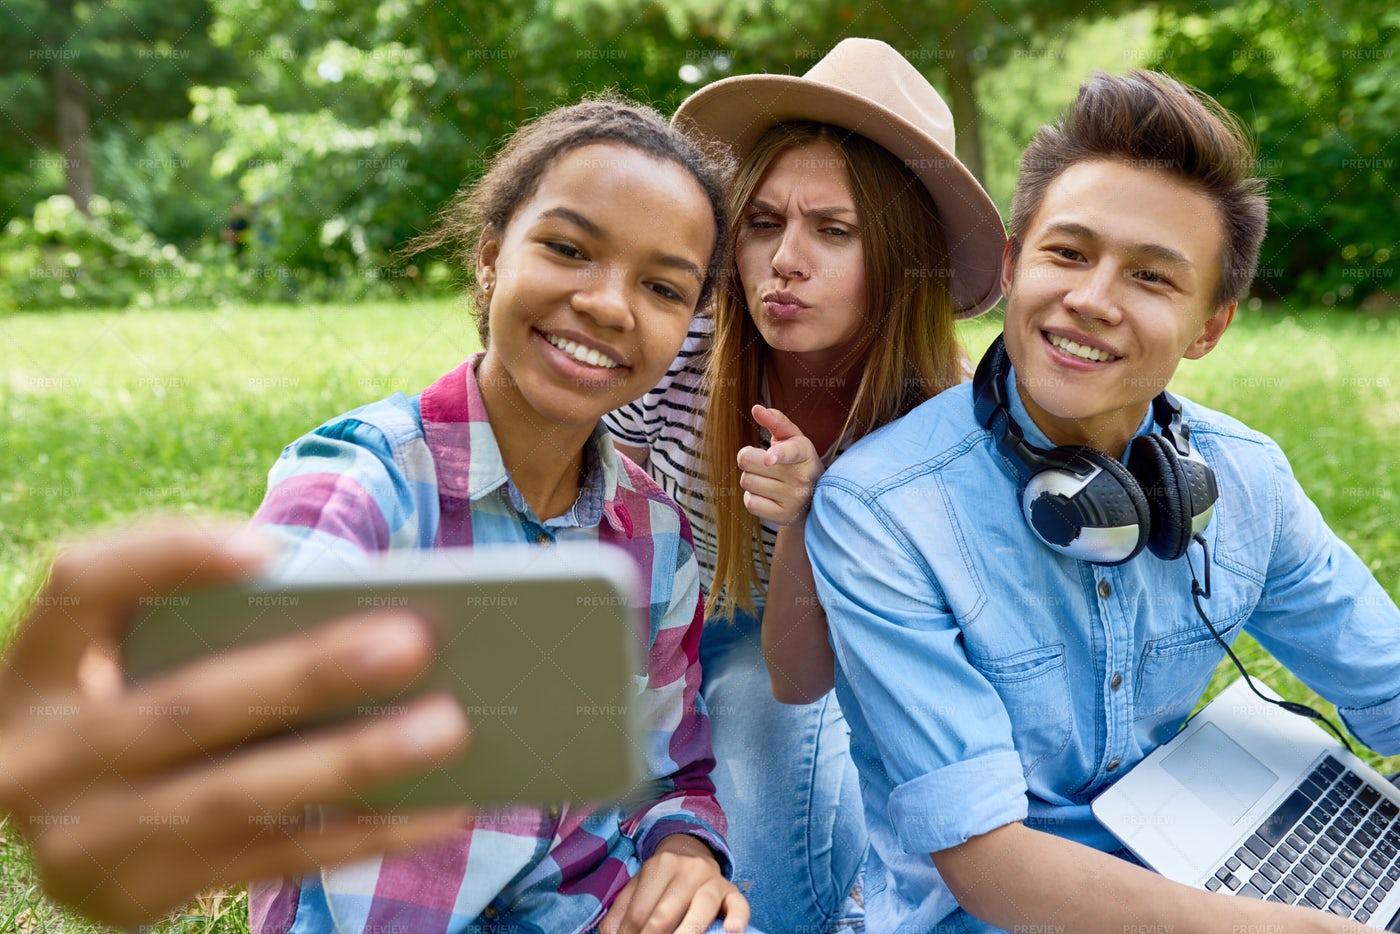 Friends Taking Selfie In Park: Stock Photos